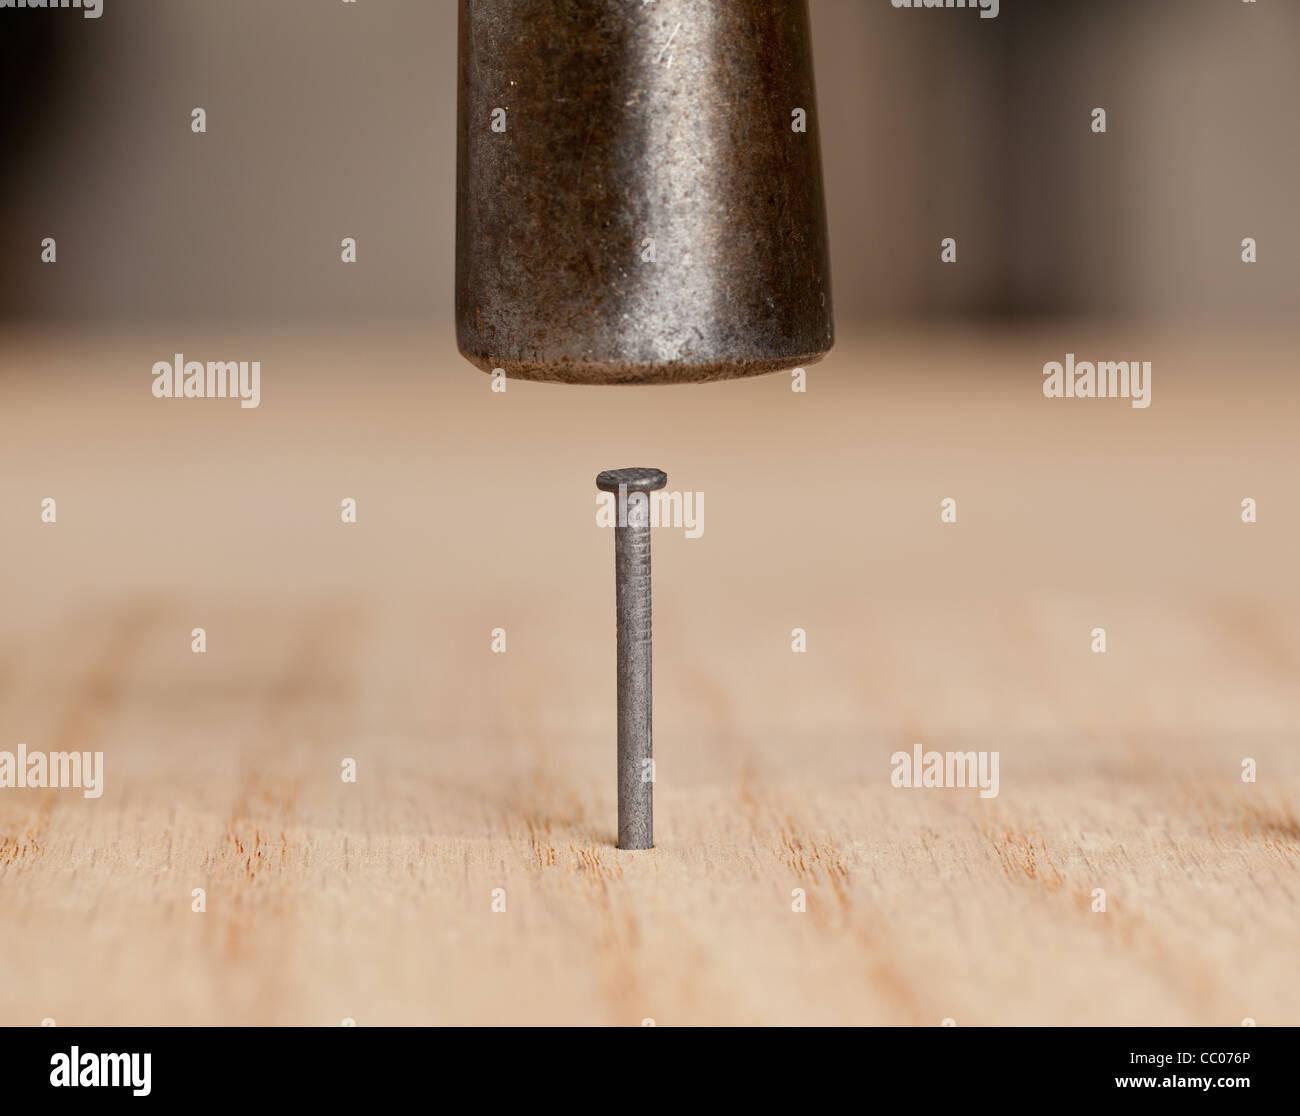 Nail empujados a la madera por un martillo Imagen De Stock